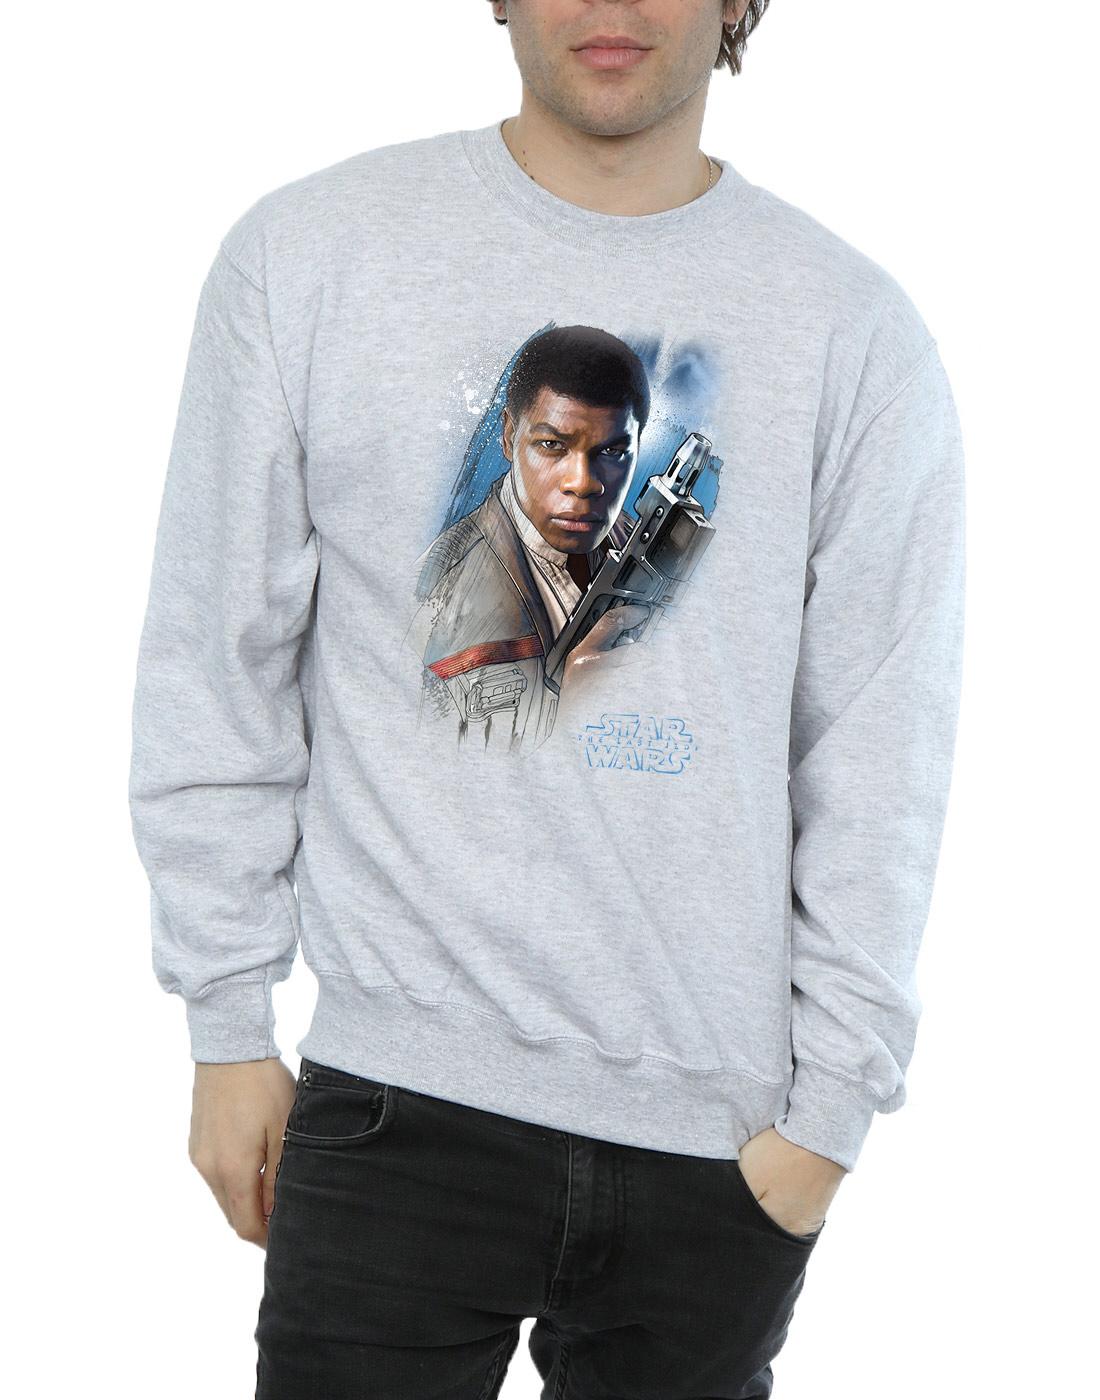 Star-Wars-Homme-The-Last-Jedi-Finn-Brushed-Sweat-Shirt